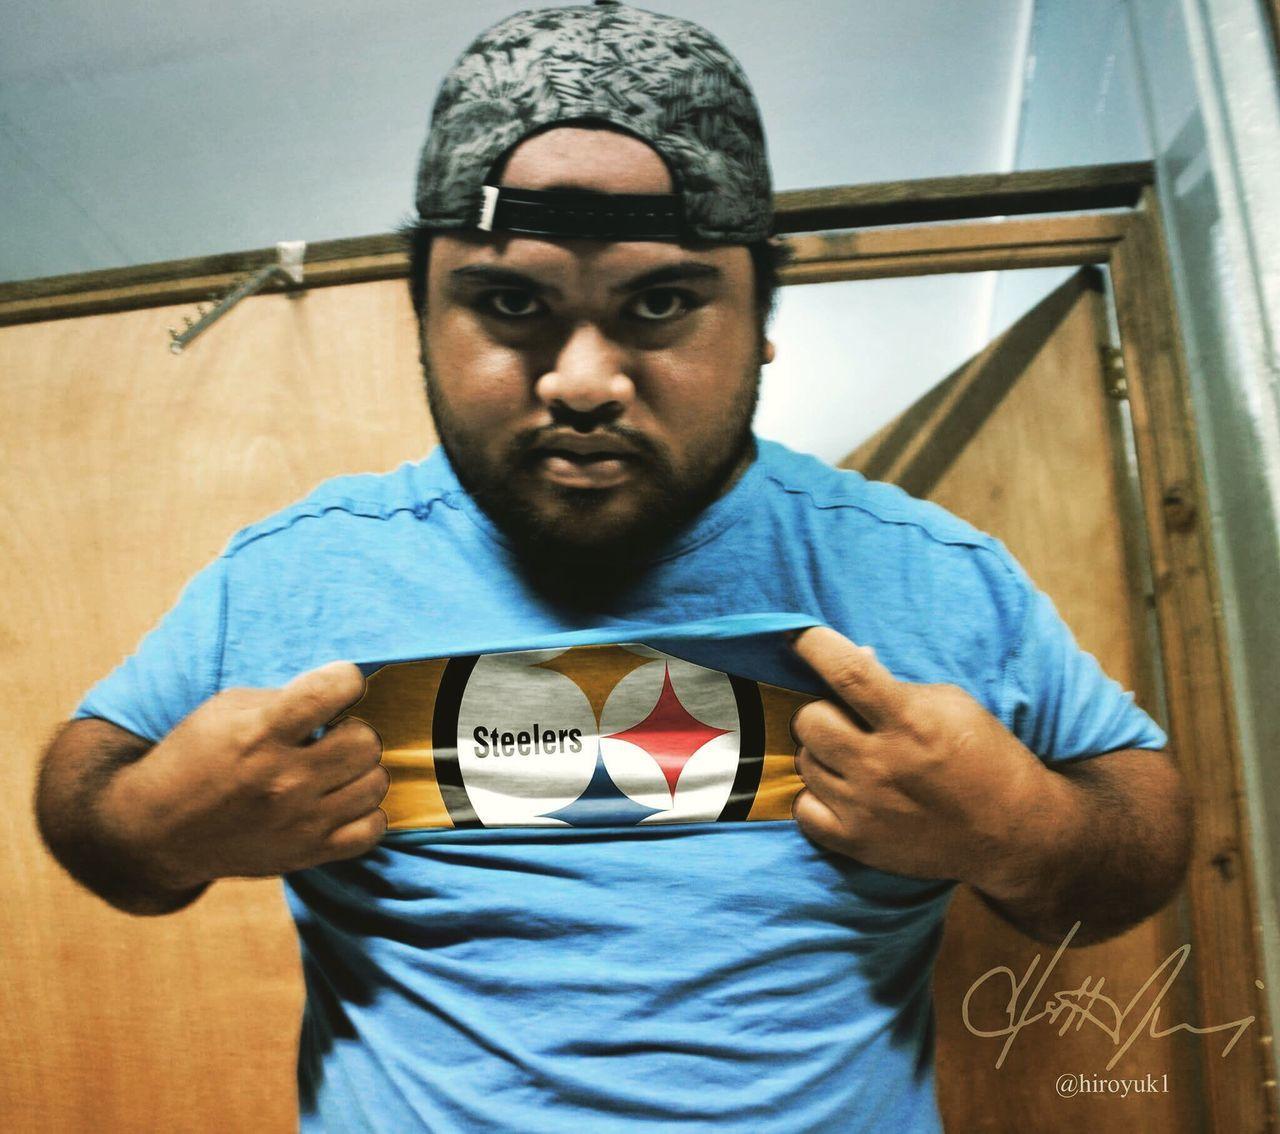 bleed Steelers SteelersNation Steelers Pride  Art Micronesia Islander Kurassa